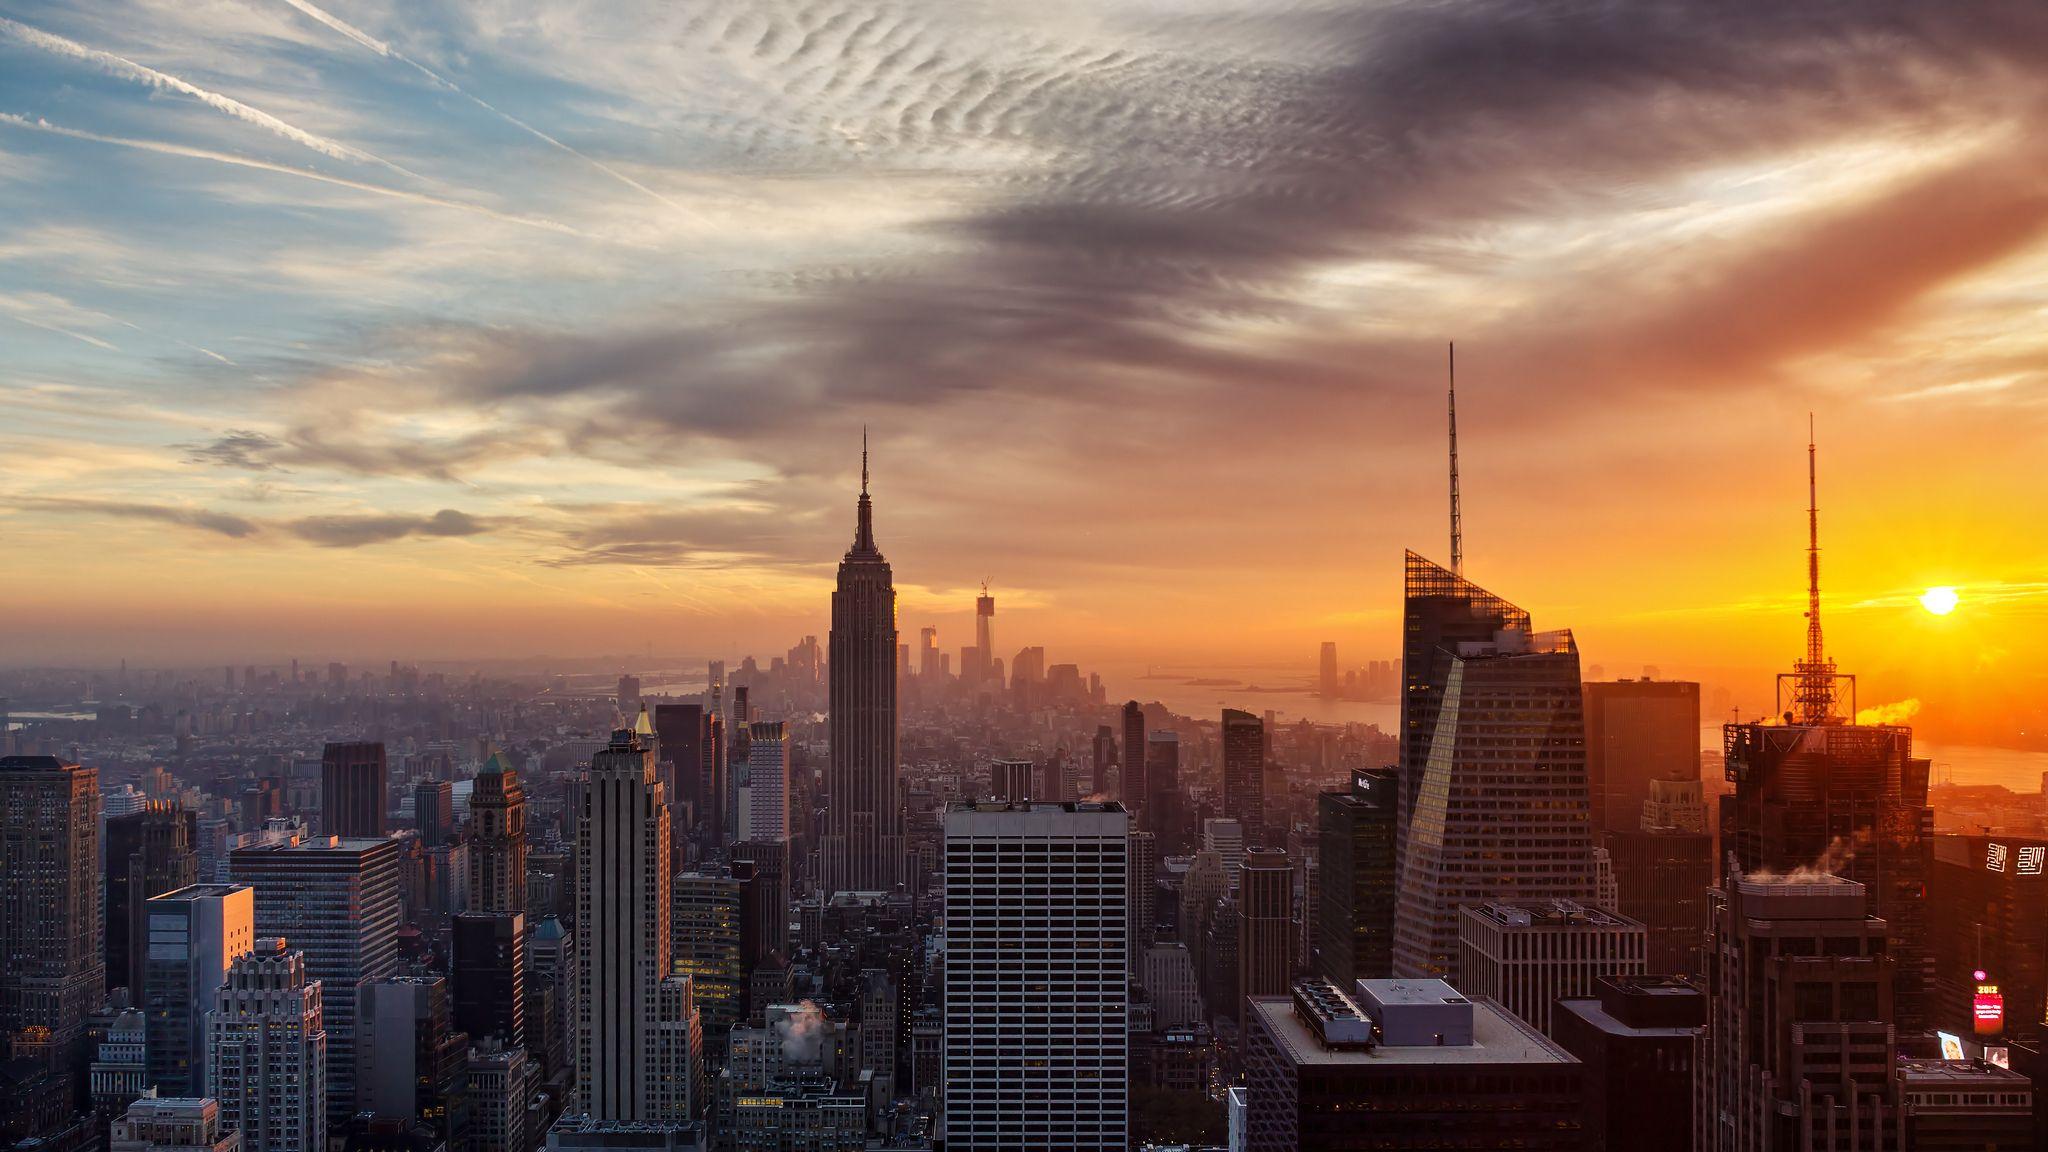 New York City Wallpaper Sunset Sunset City New York Wallpaper New York City Background